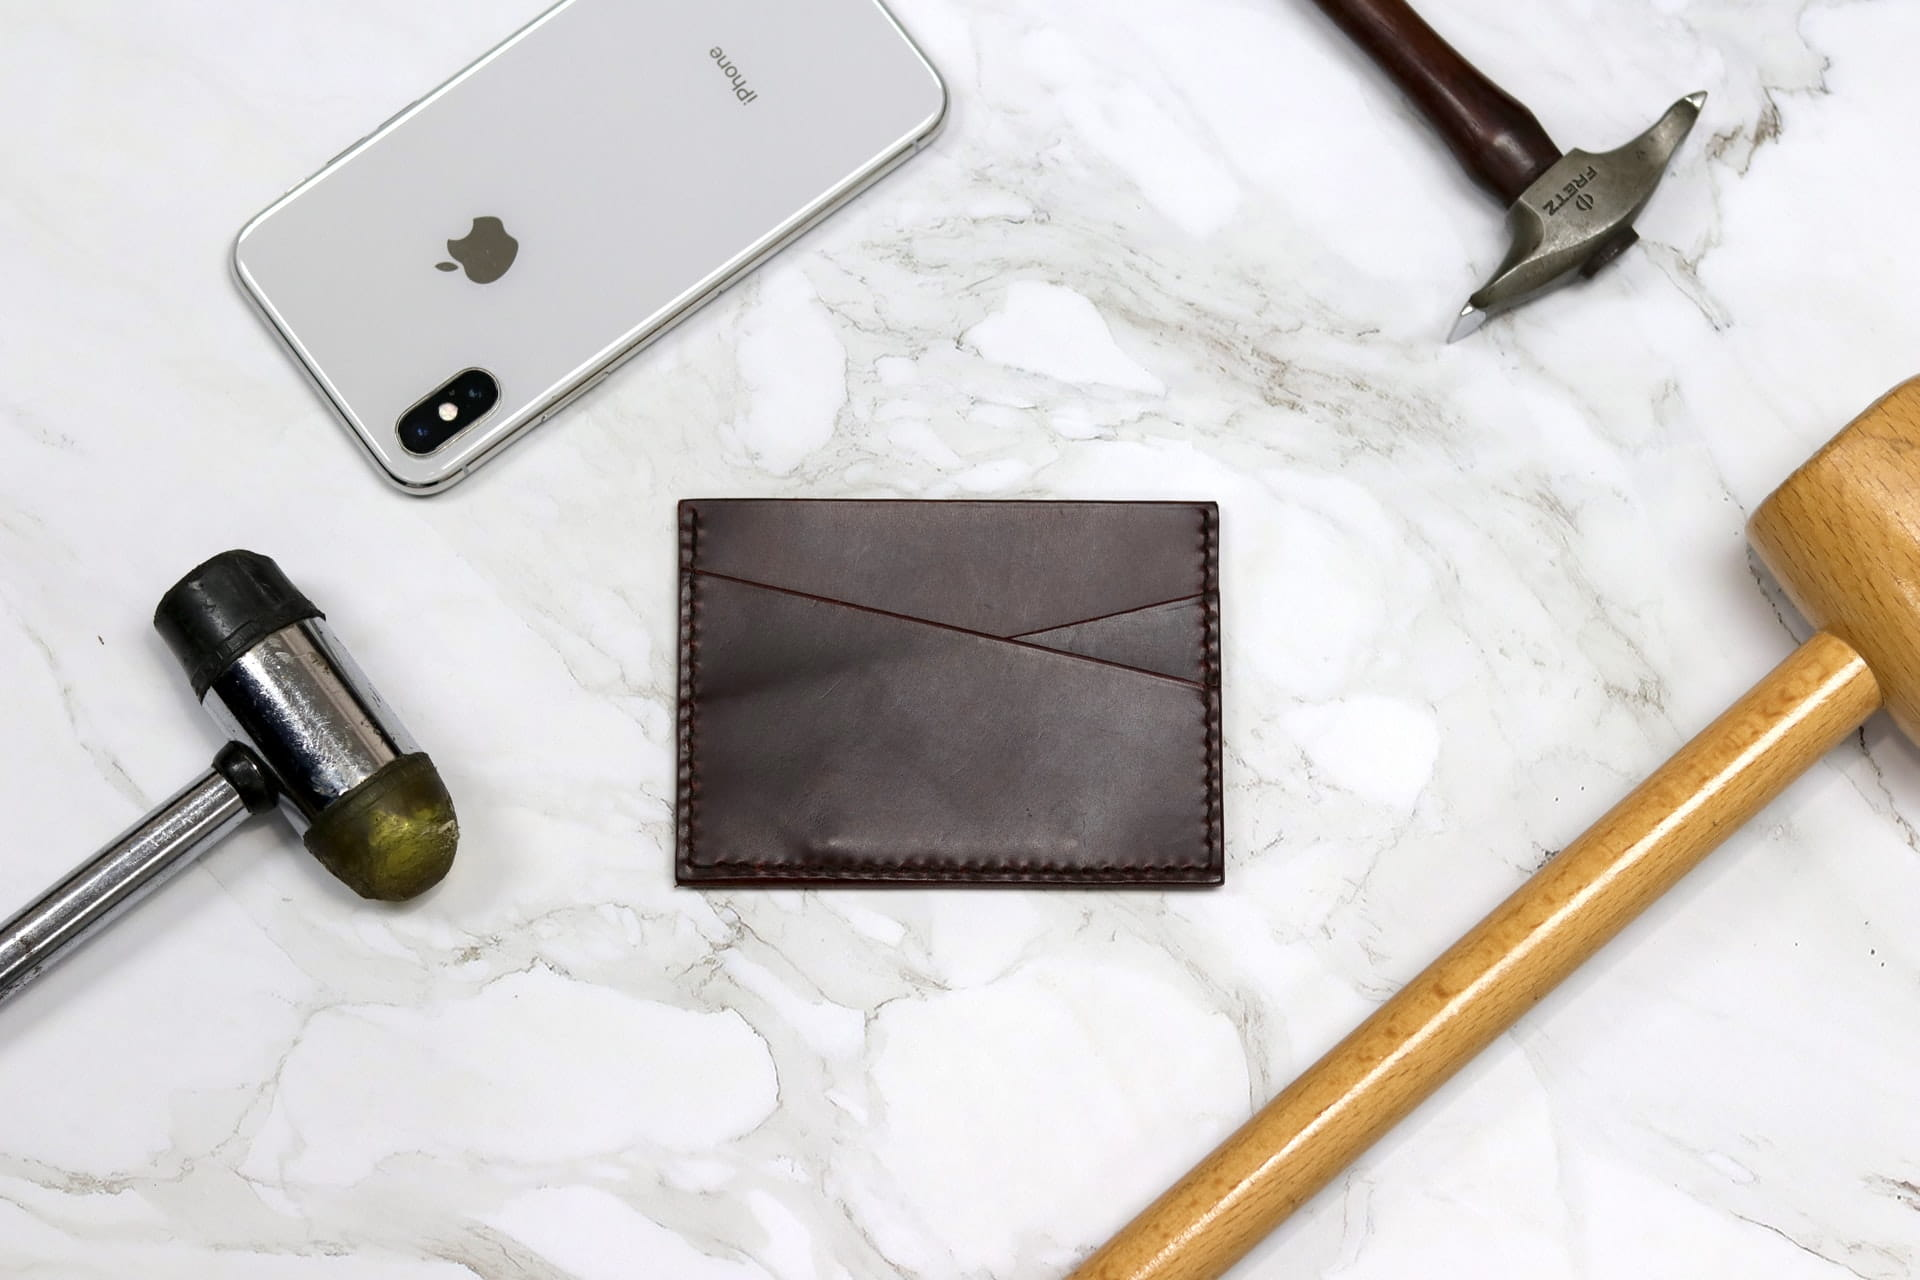 billetera-arreglar-unsplash